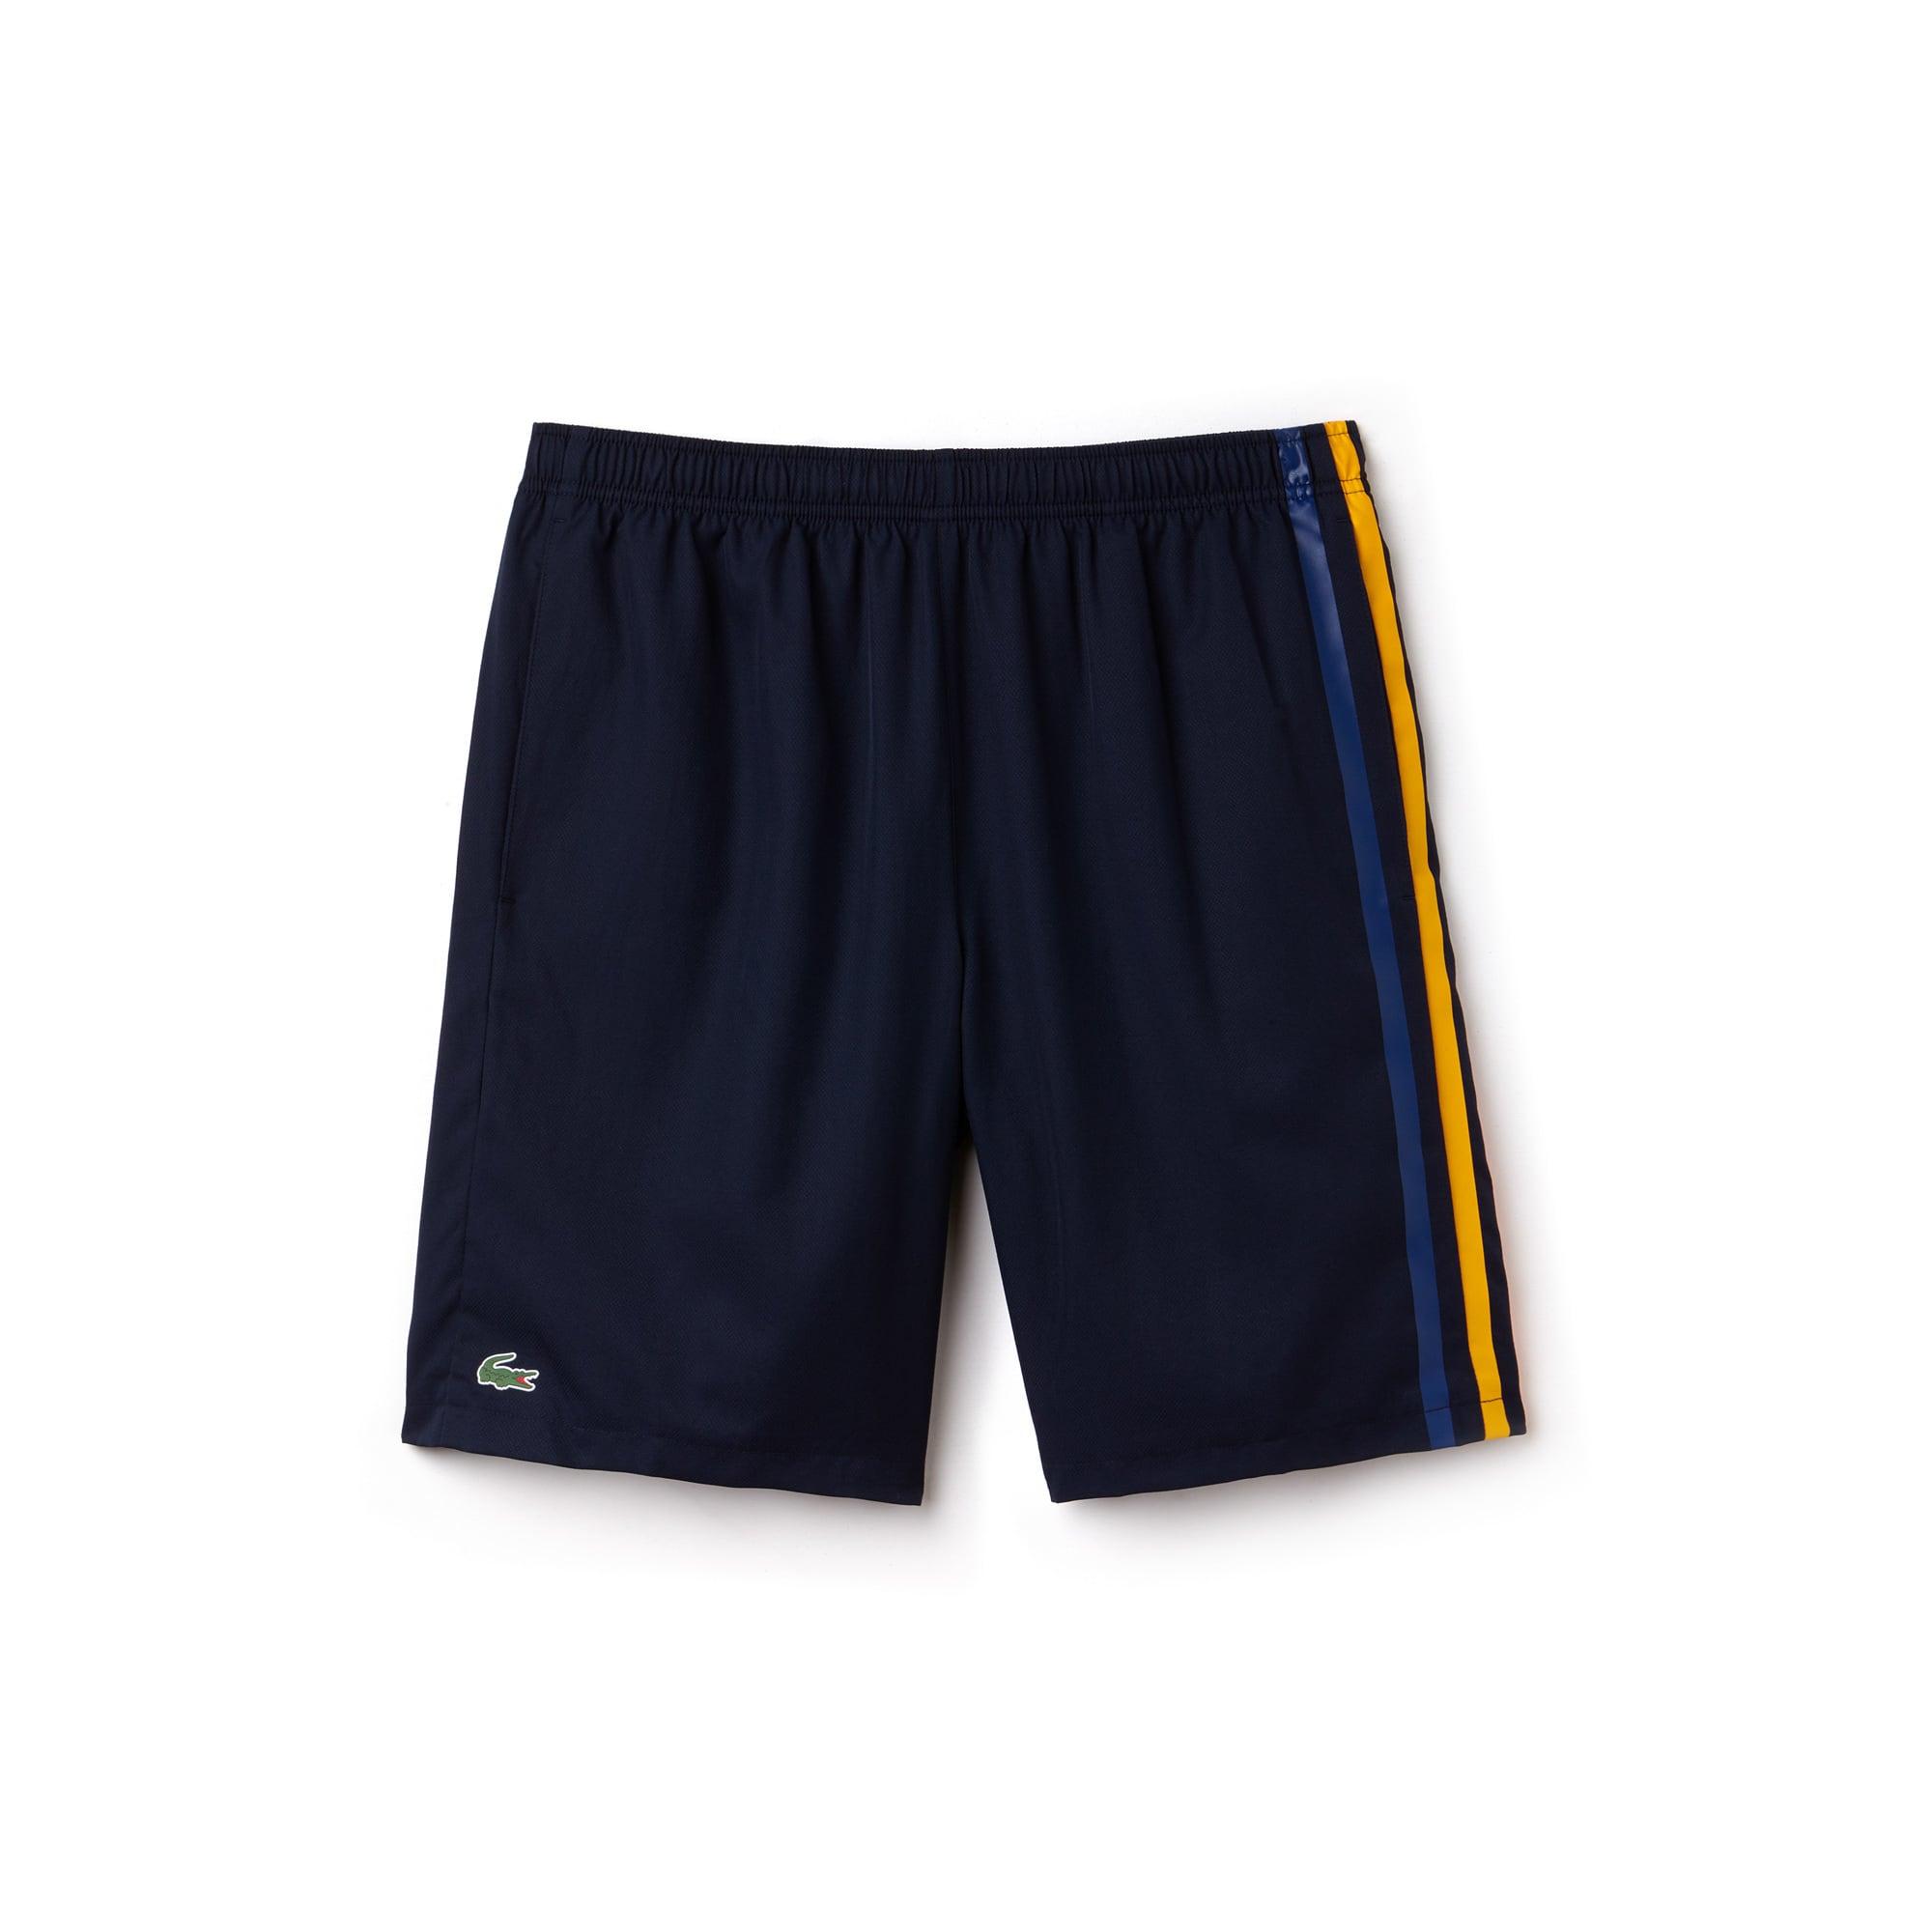 85372a992f03 Men s Lacoste SPORT Colored Bands Taffeta Tennis Shorts